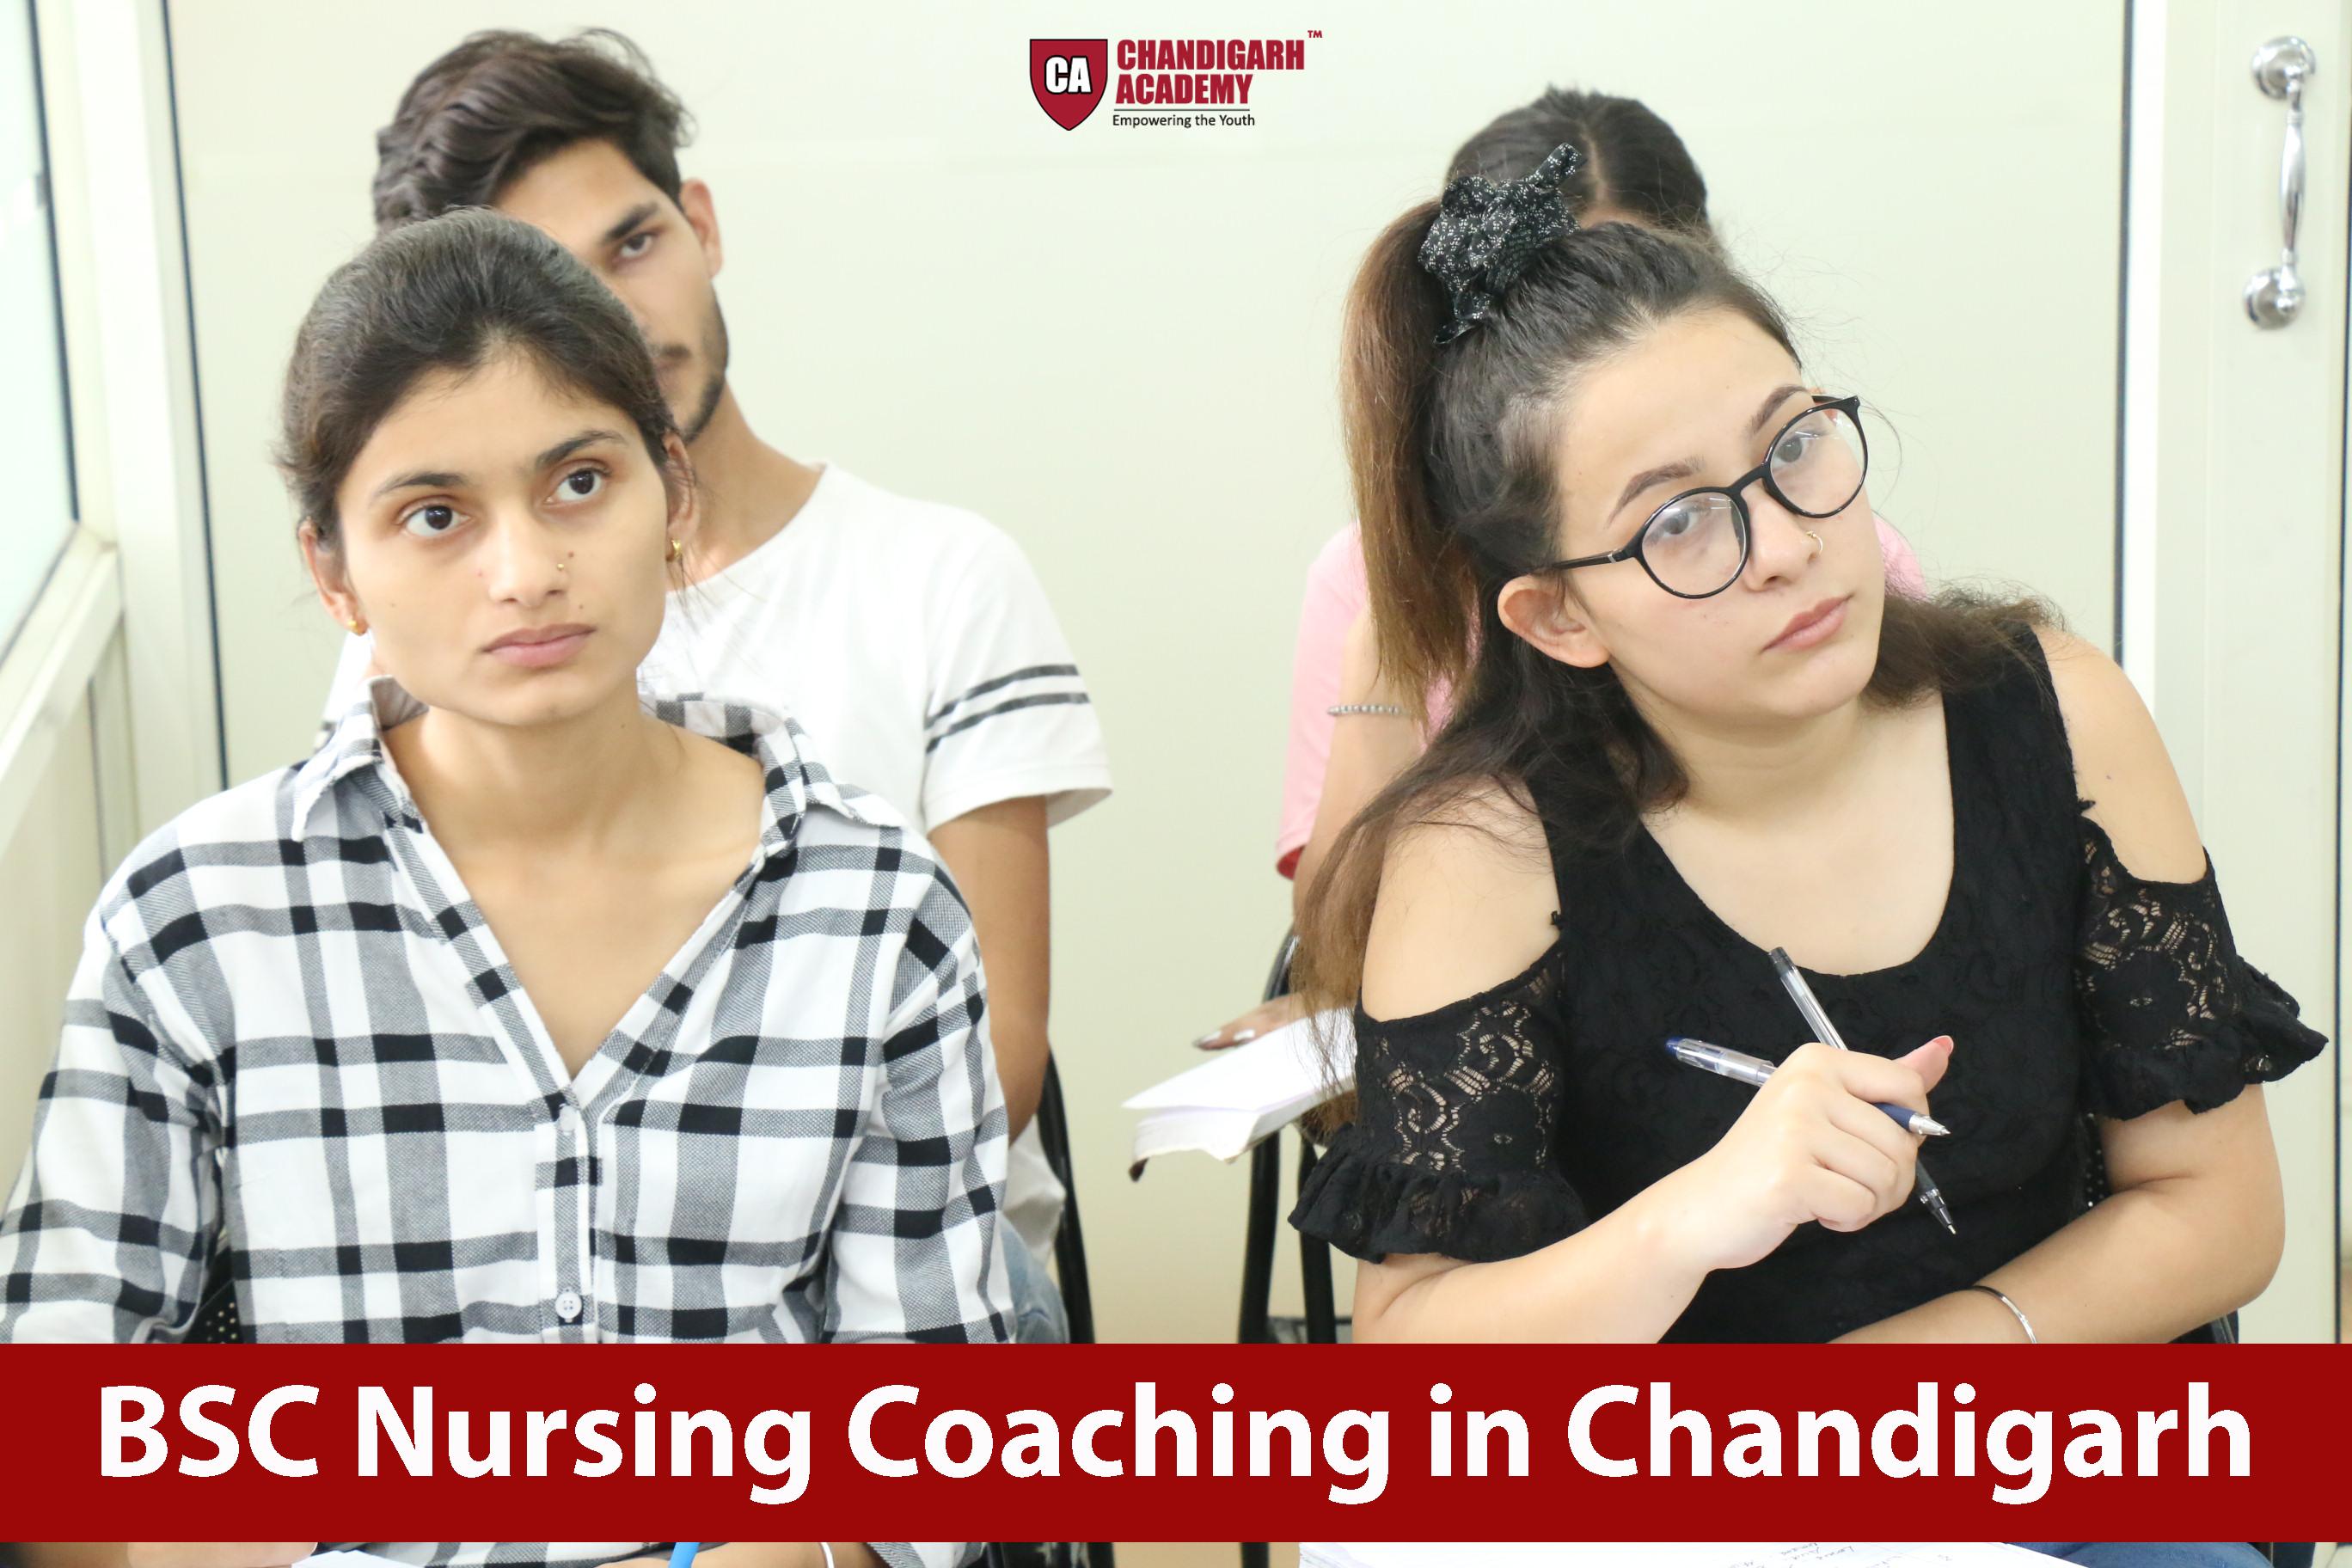 BSC Nursing Coaching in Chandigarh